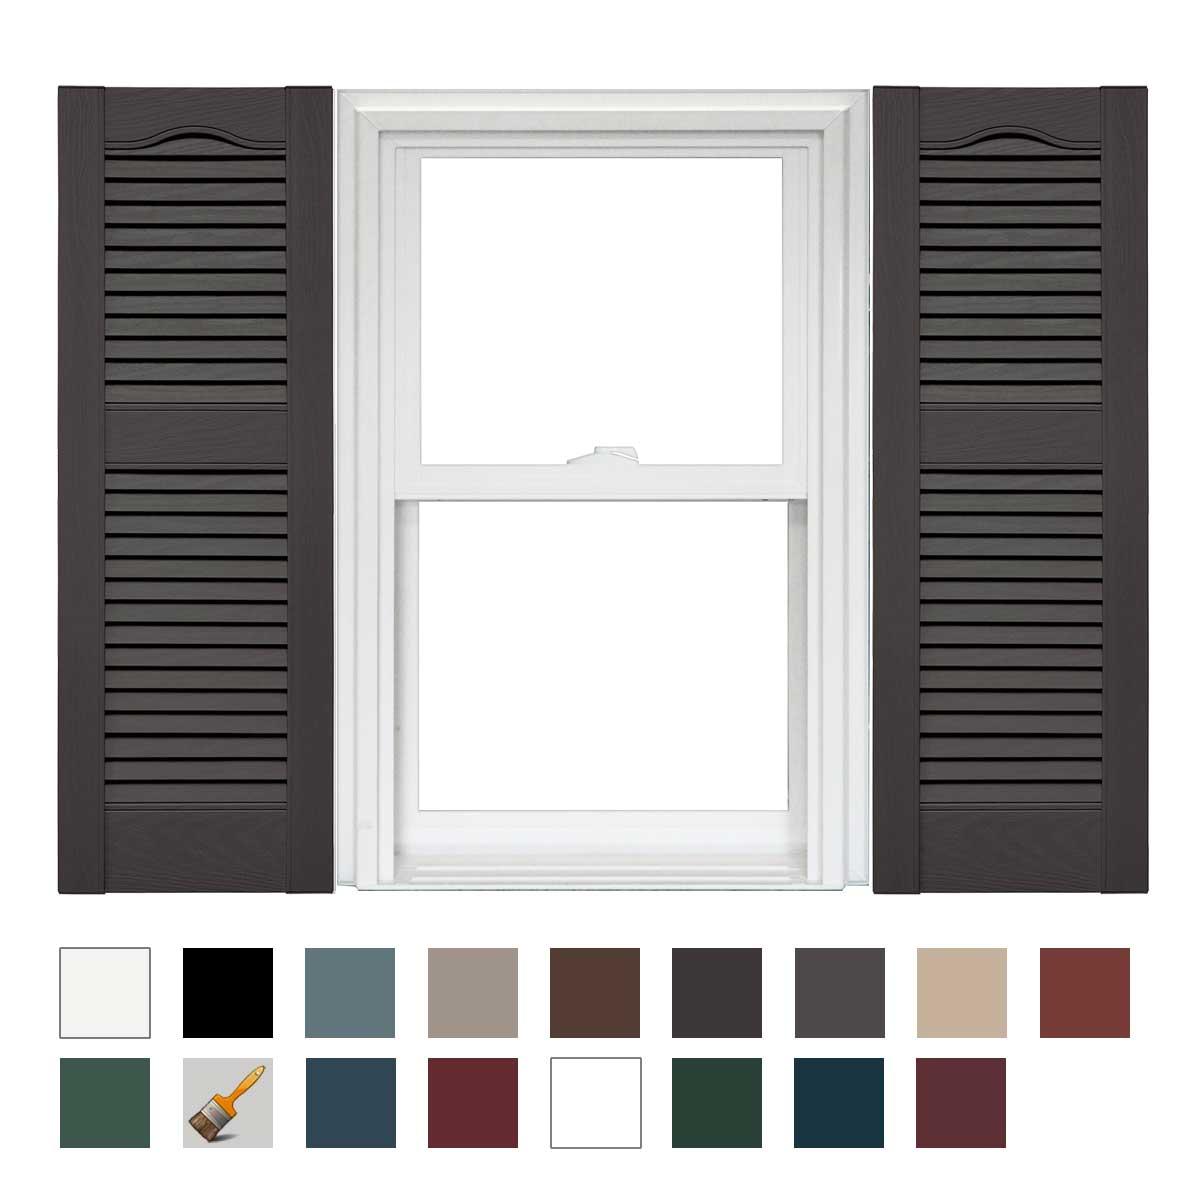 14.5 x 43 018 Tuxedo Gray